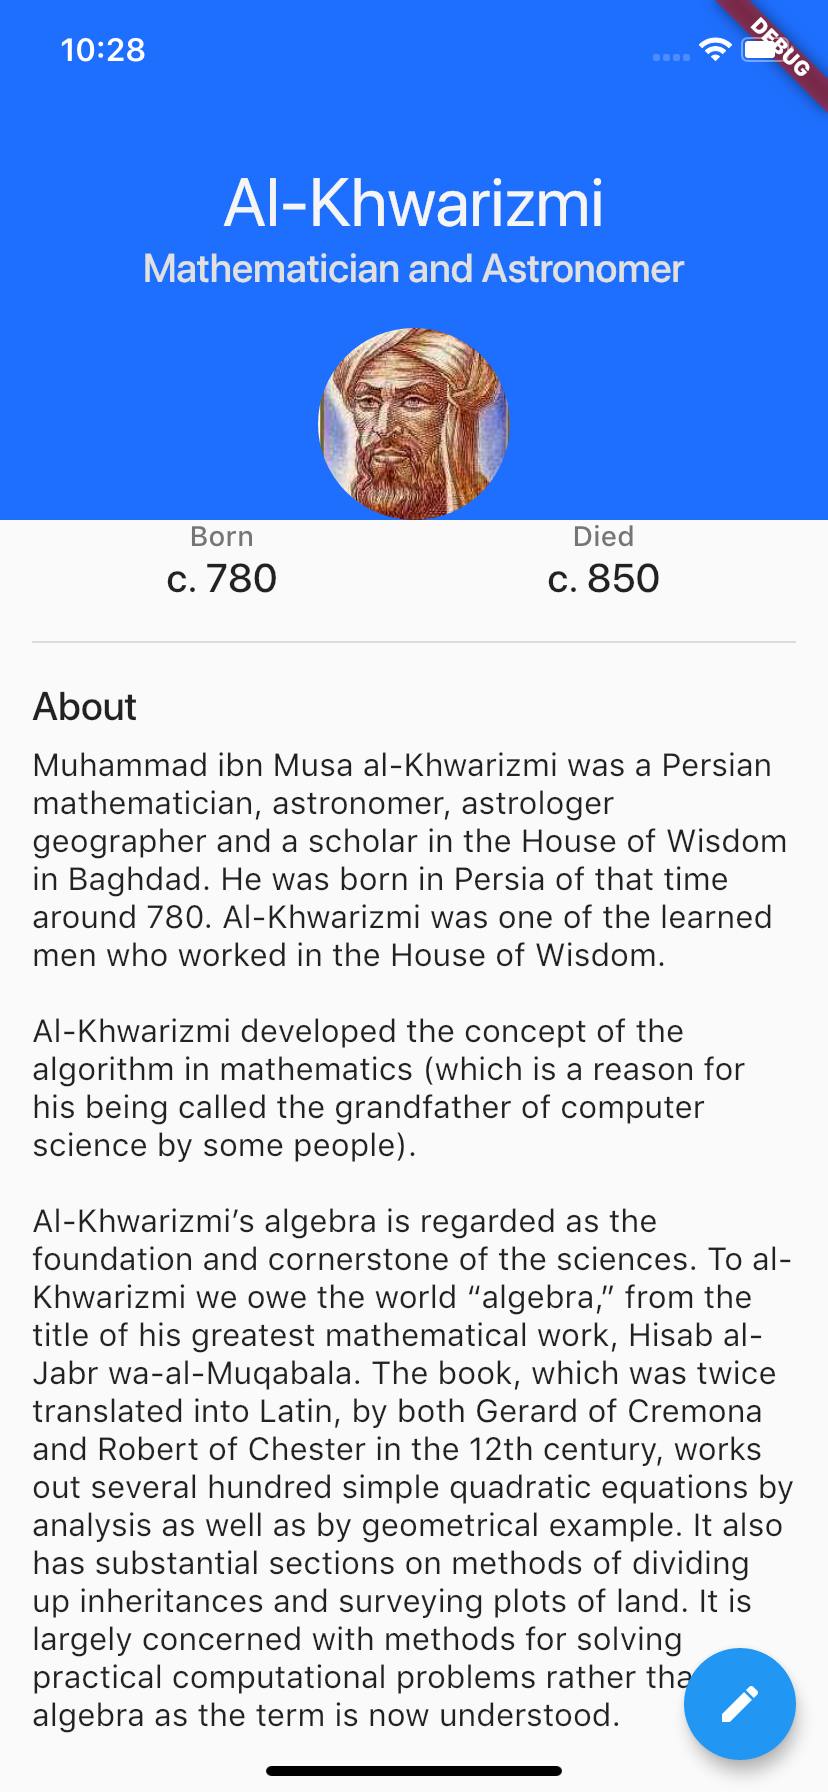 The starter app showing a plain bio card